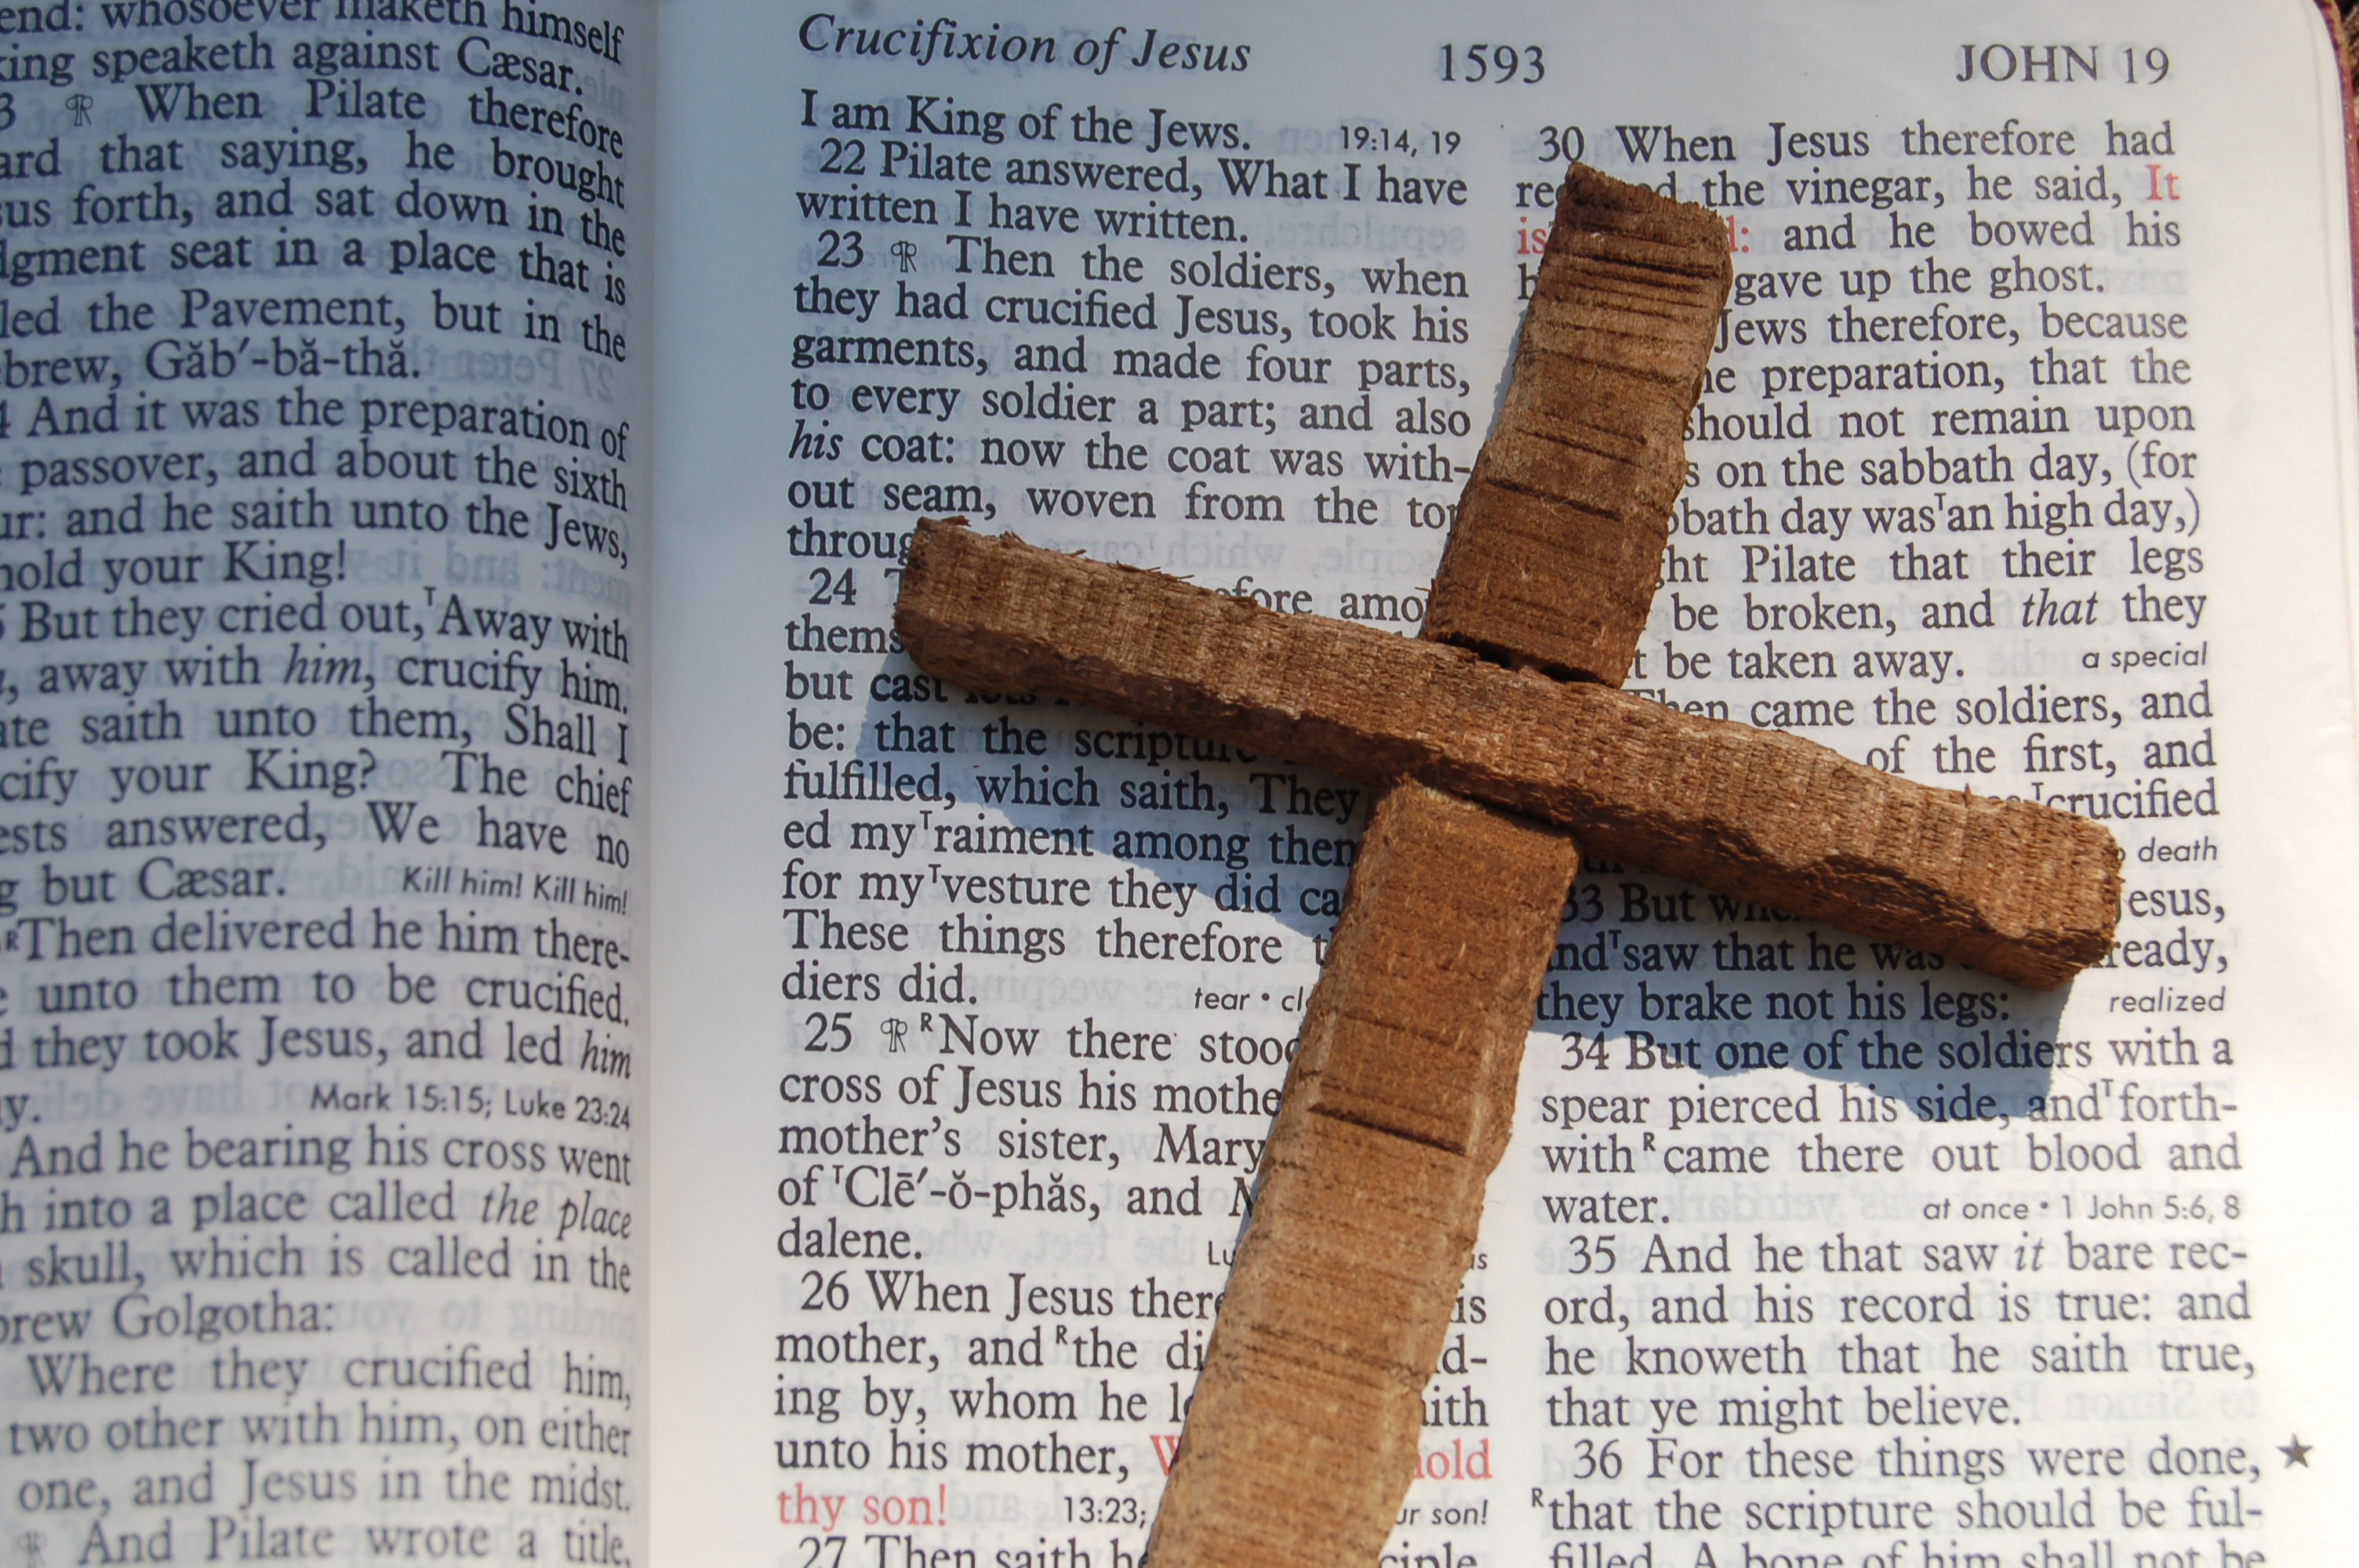 Christian Stock Photos by Linda Bateman - Wood Cross on Open Bible